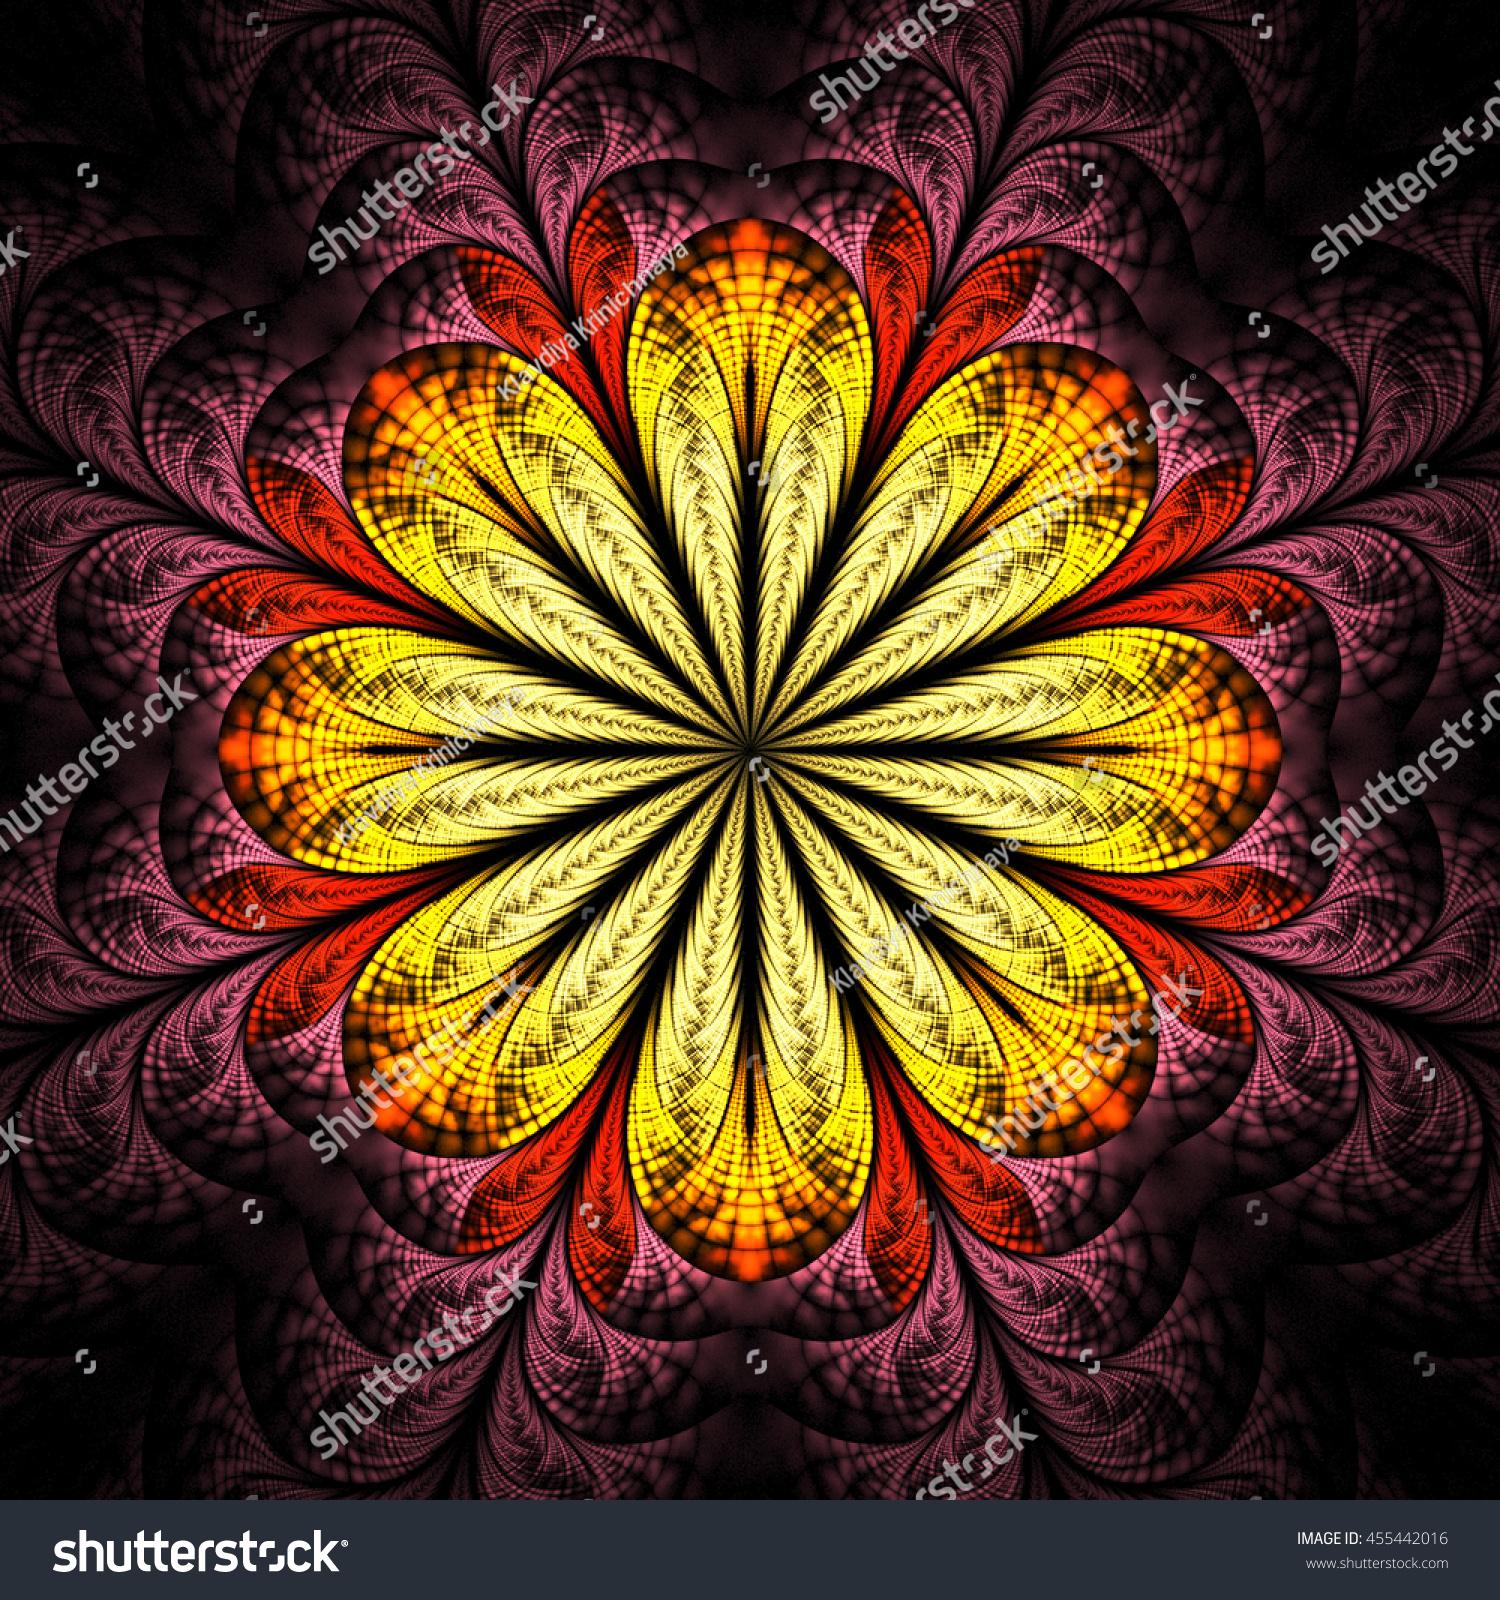 Fractal Black Flower Free Stock Photo: Abstract Flower Mandala On Black Background Stock